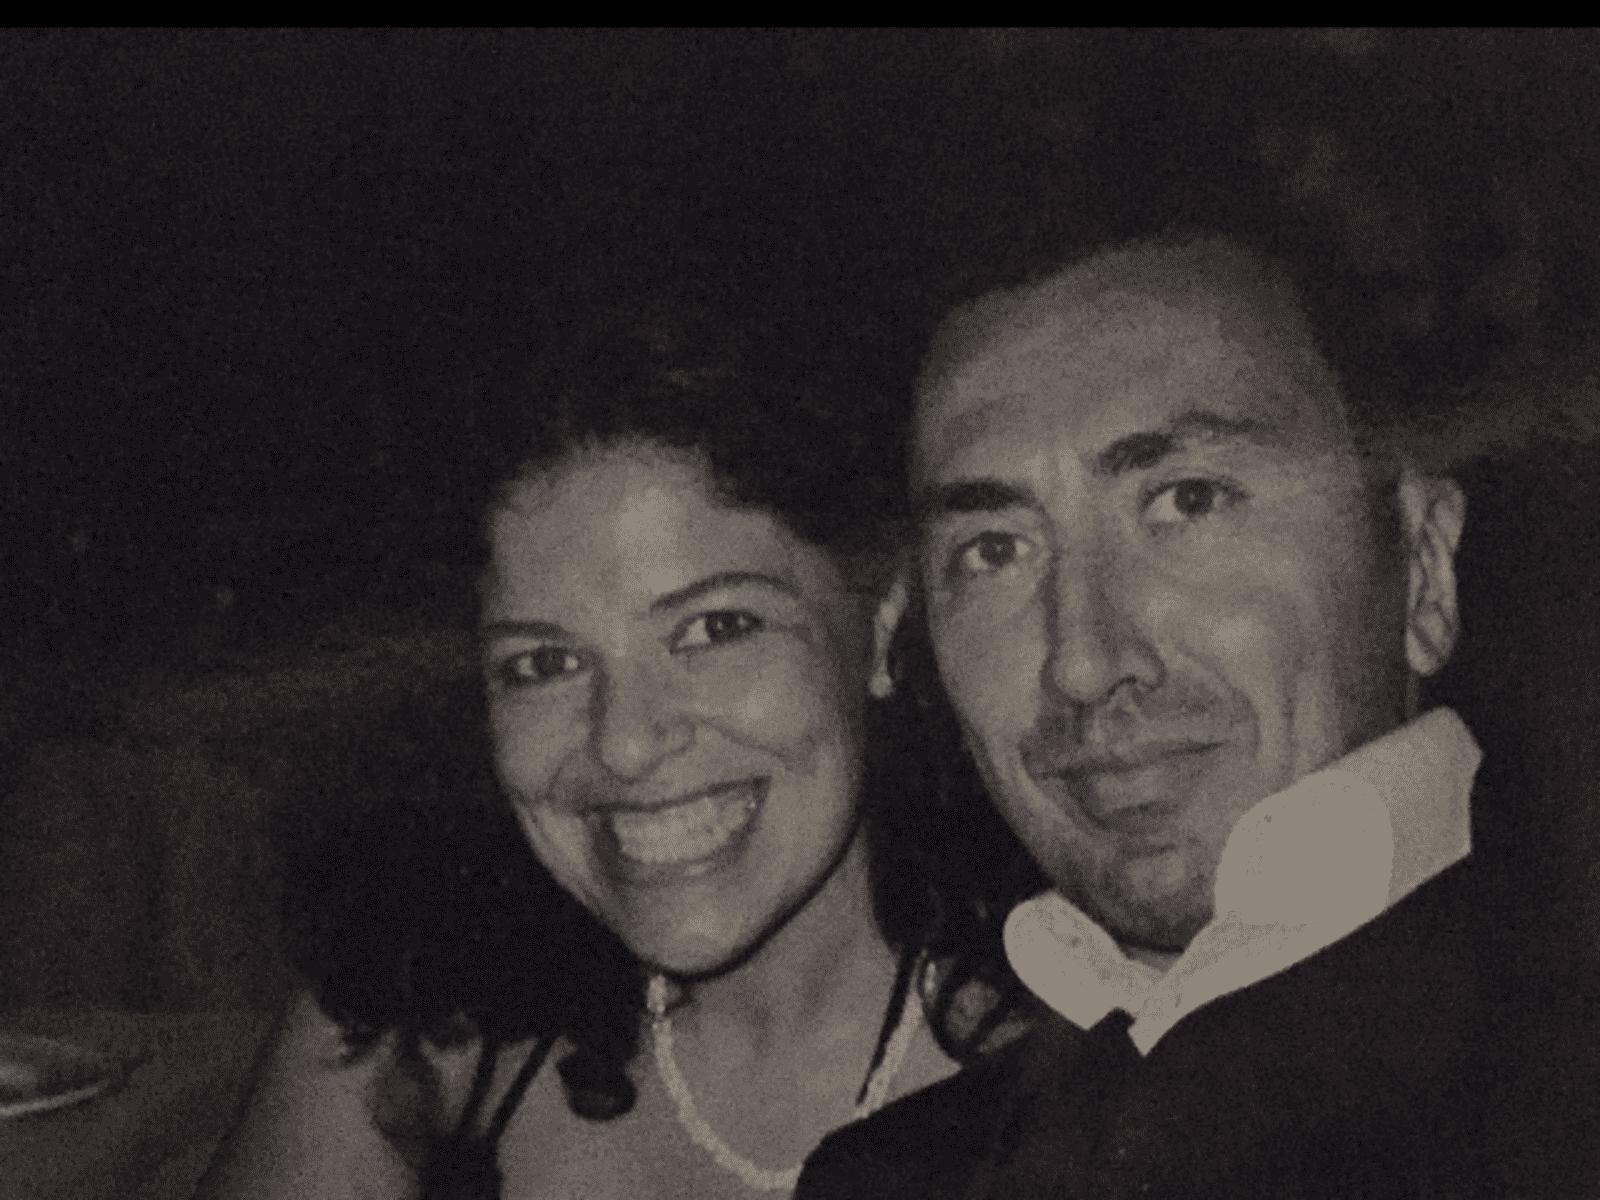 Maria lucia & Mario from Perugia, Italy